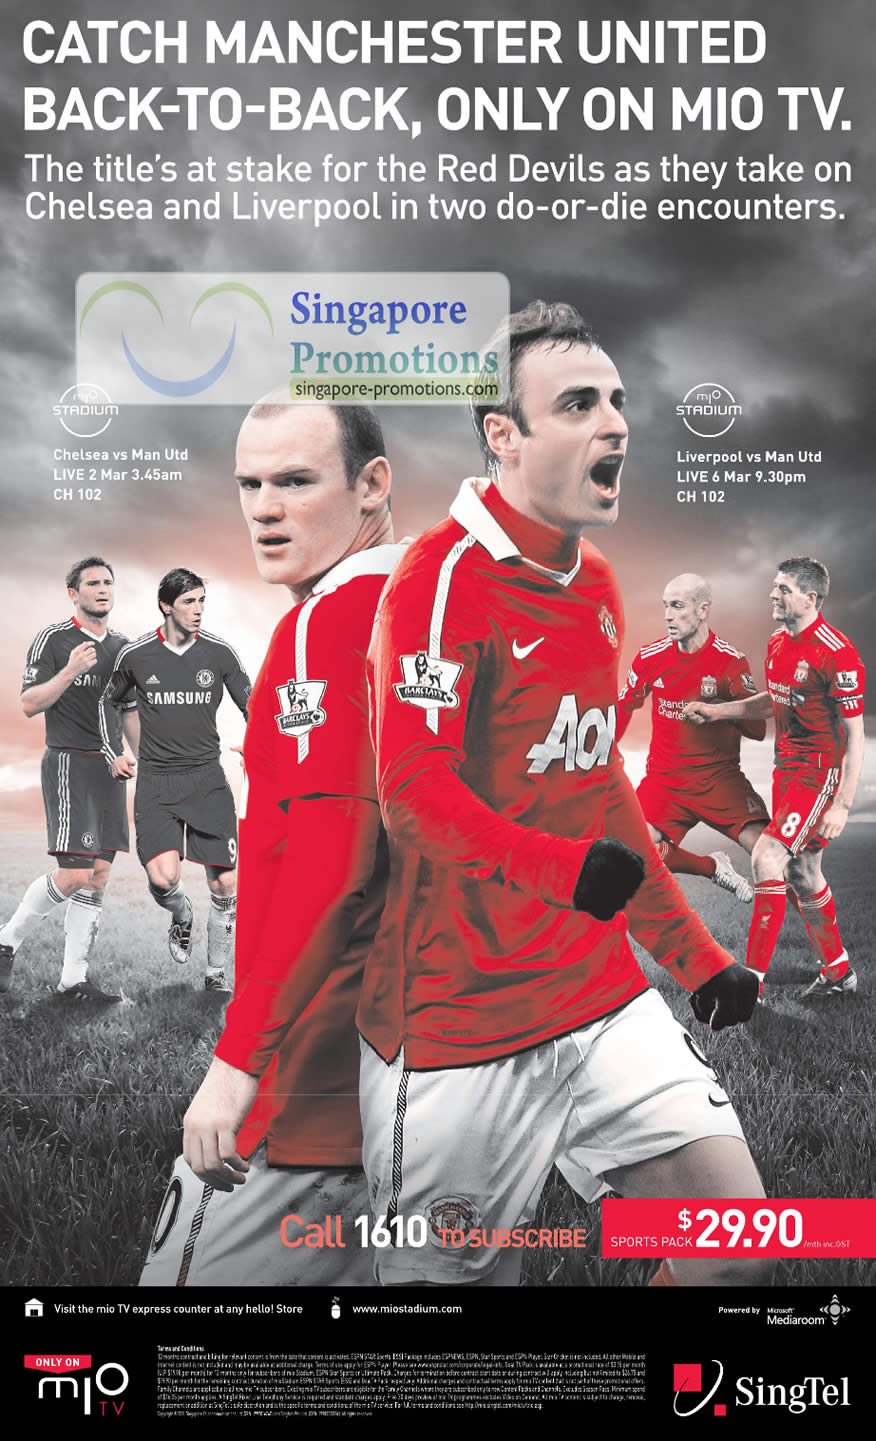 Mio TV, Manchester United, MIO STADIUM, Sports Pack Singtel Mobile ...